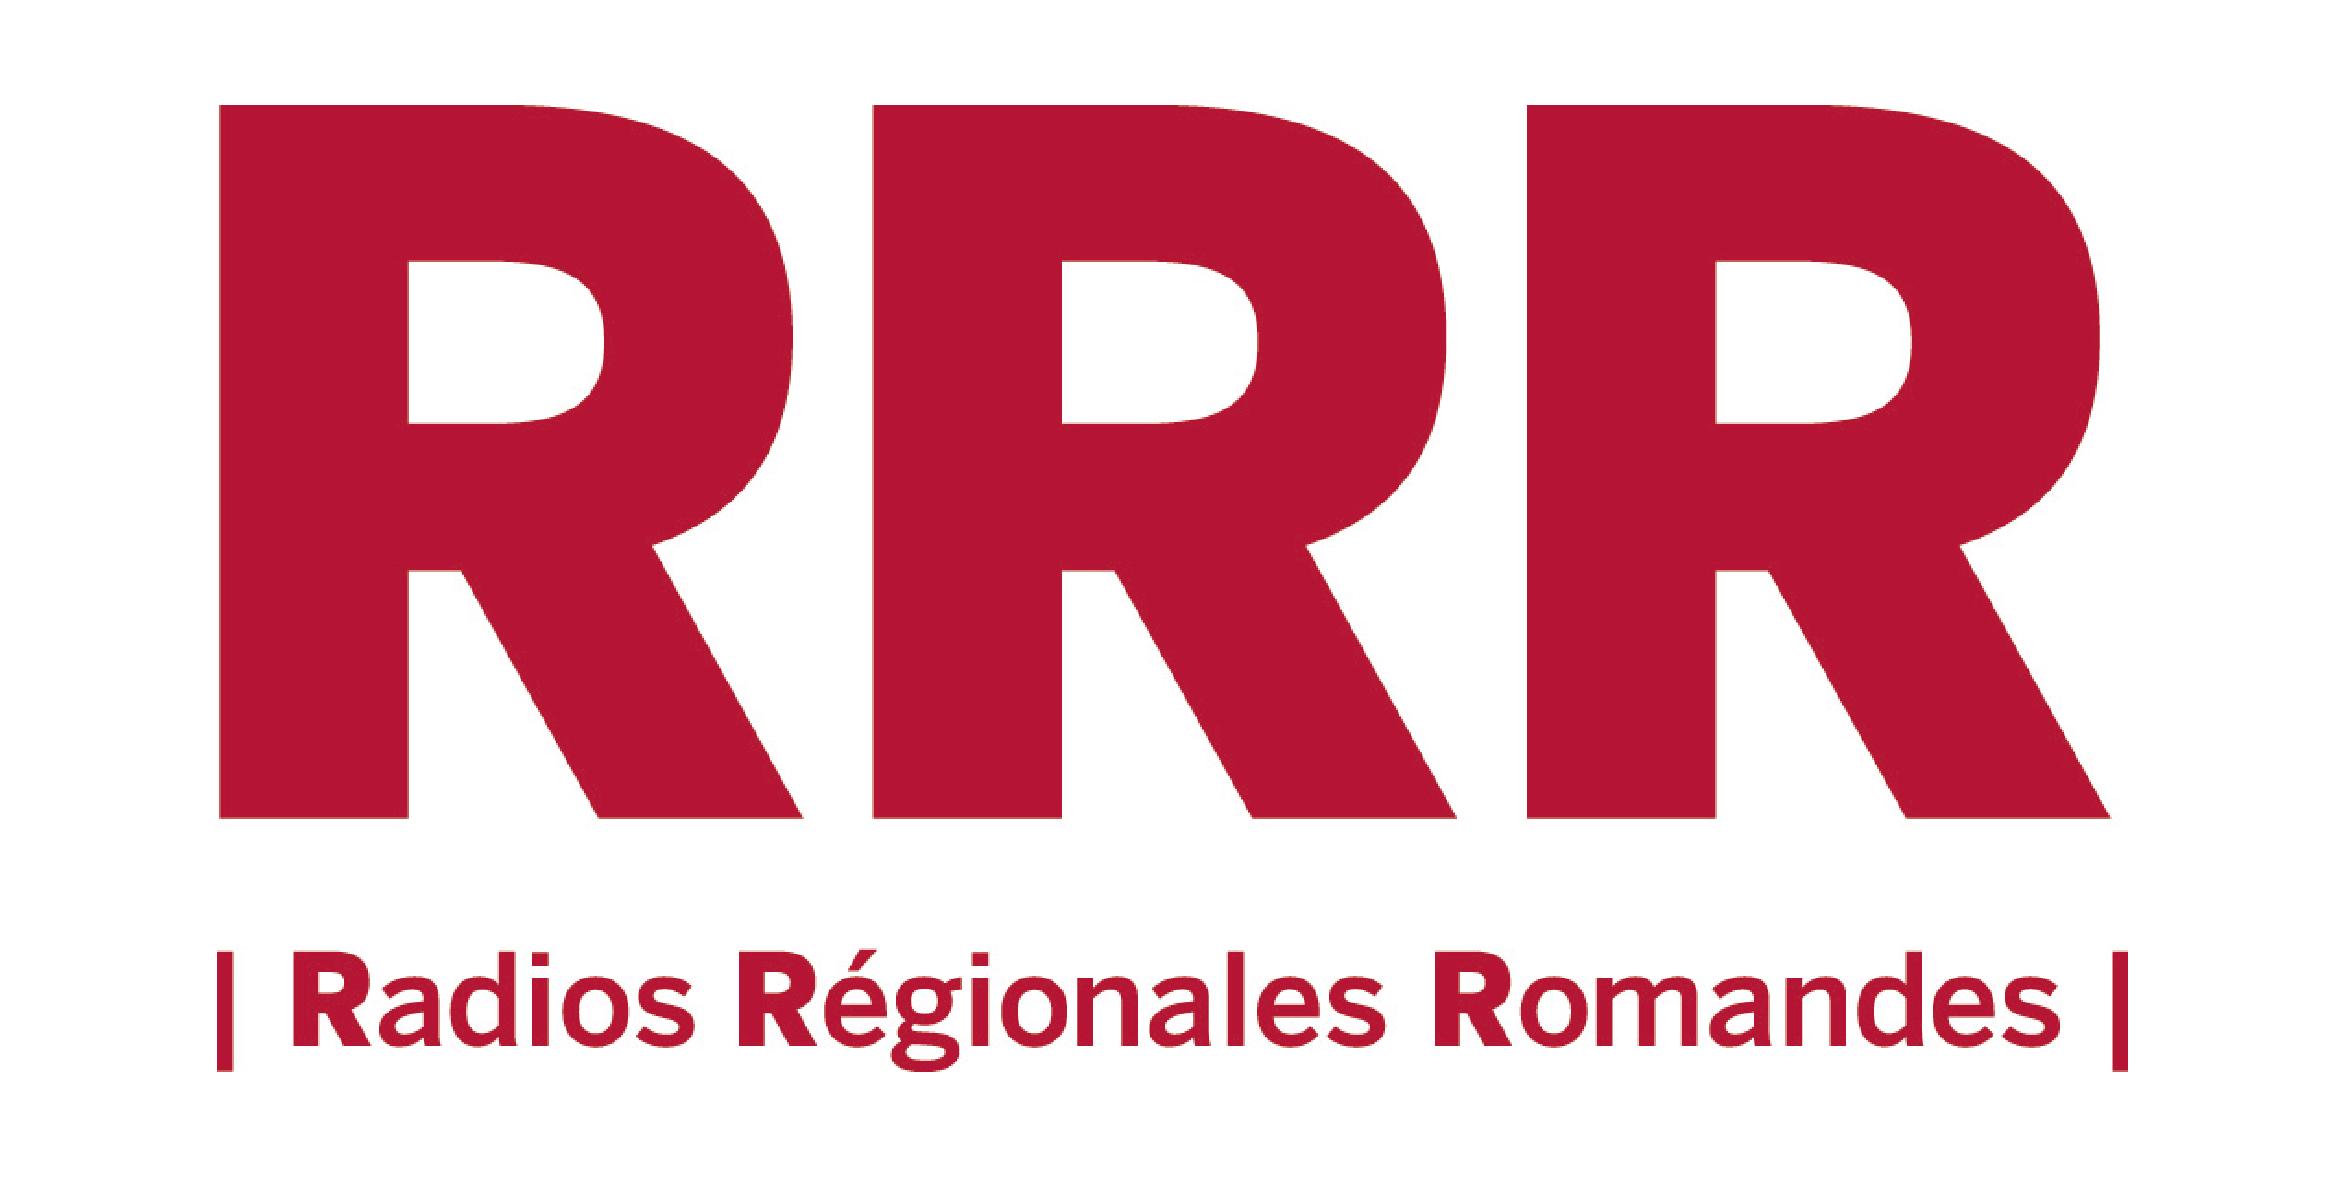 radios_regionales_romandes-01